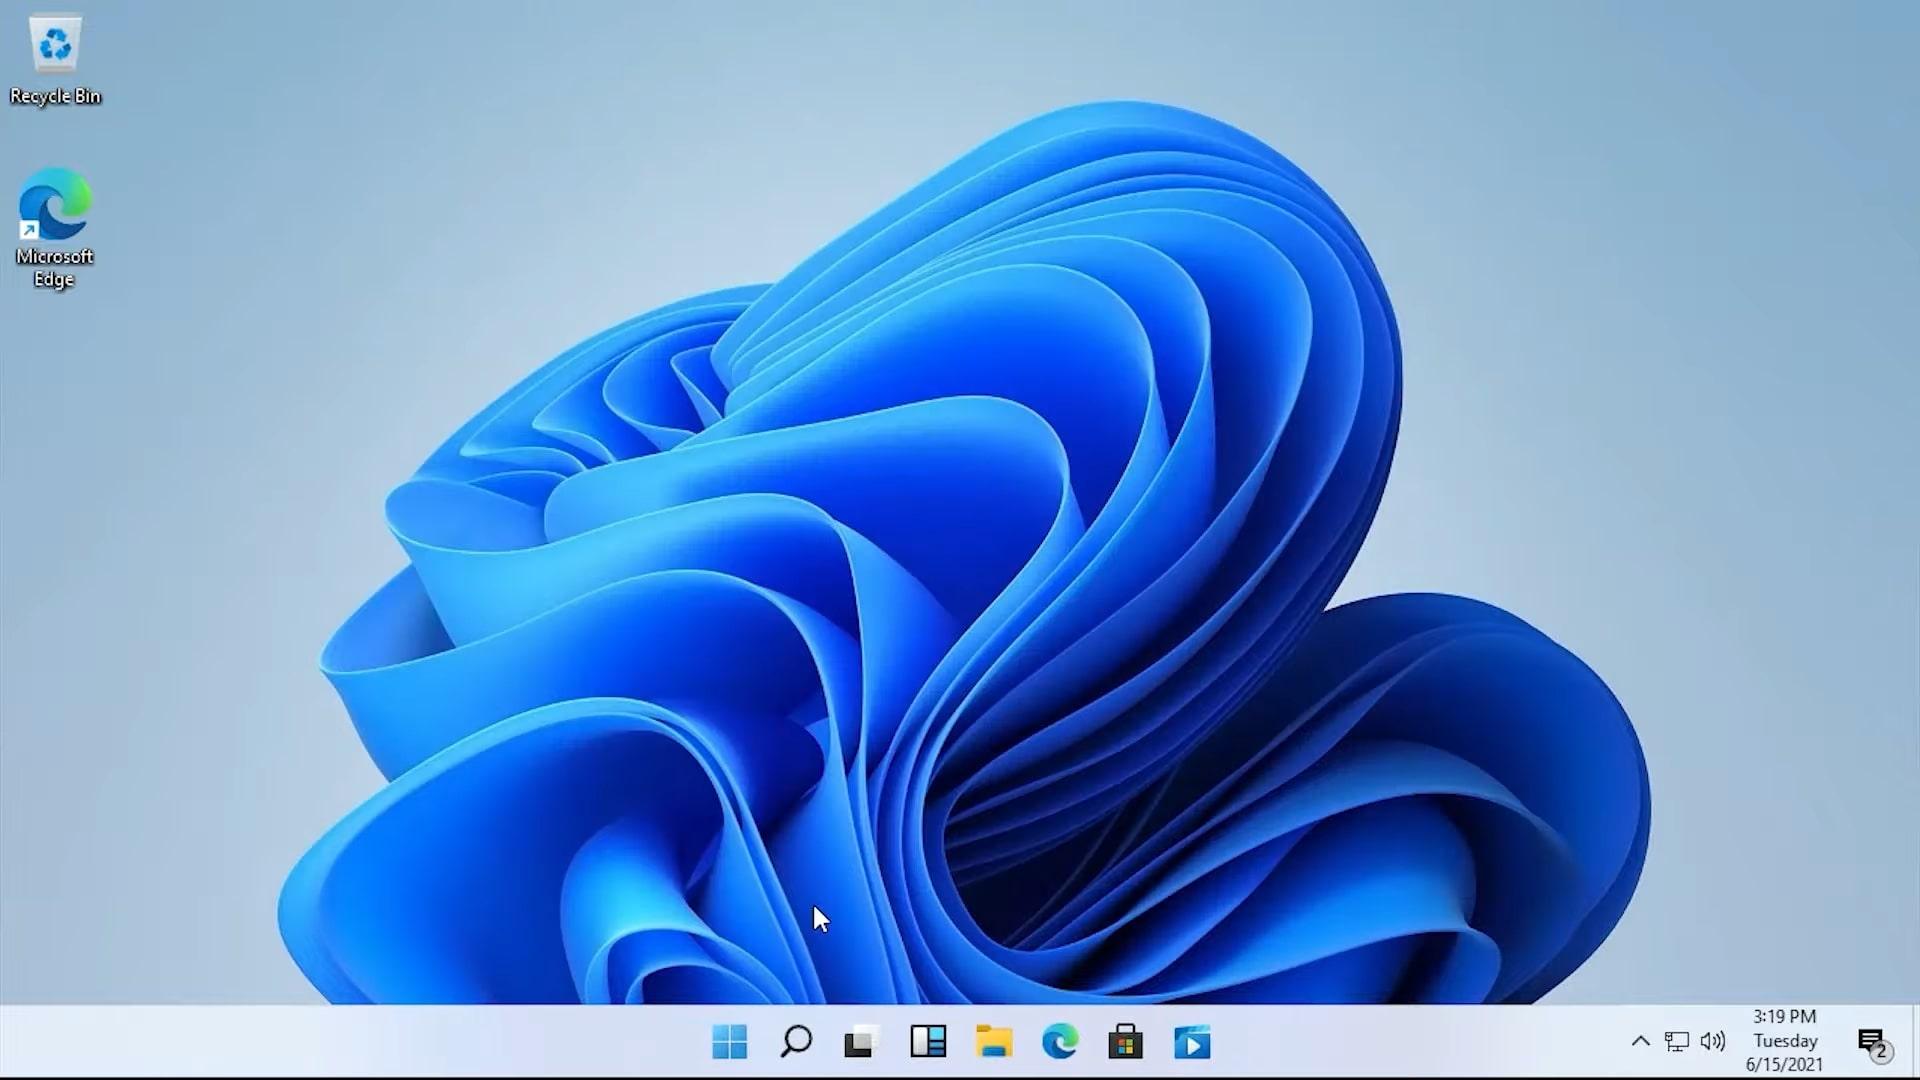 Windows 11 wallpapers